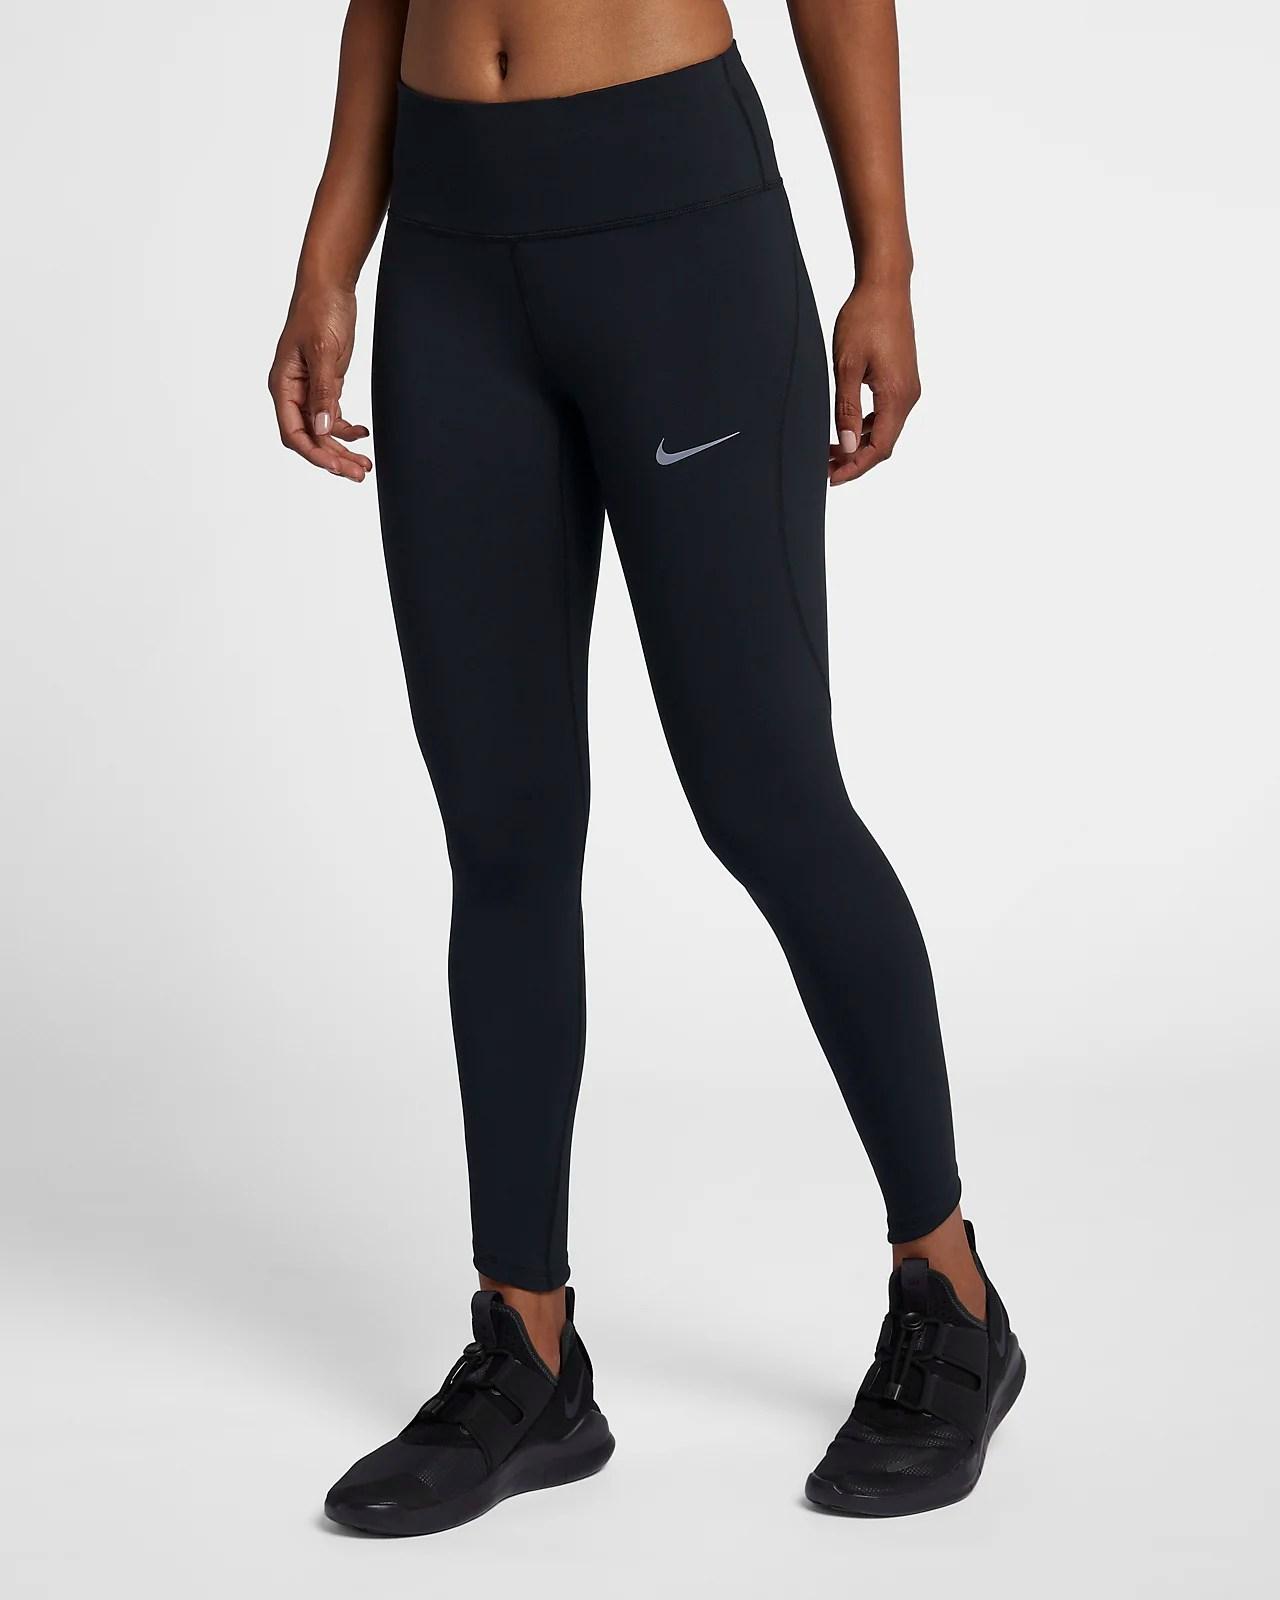 Nike Epic Lux 女款高腰 7/8 跑步緊身褲. Nike TW